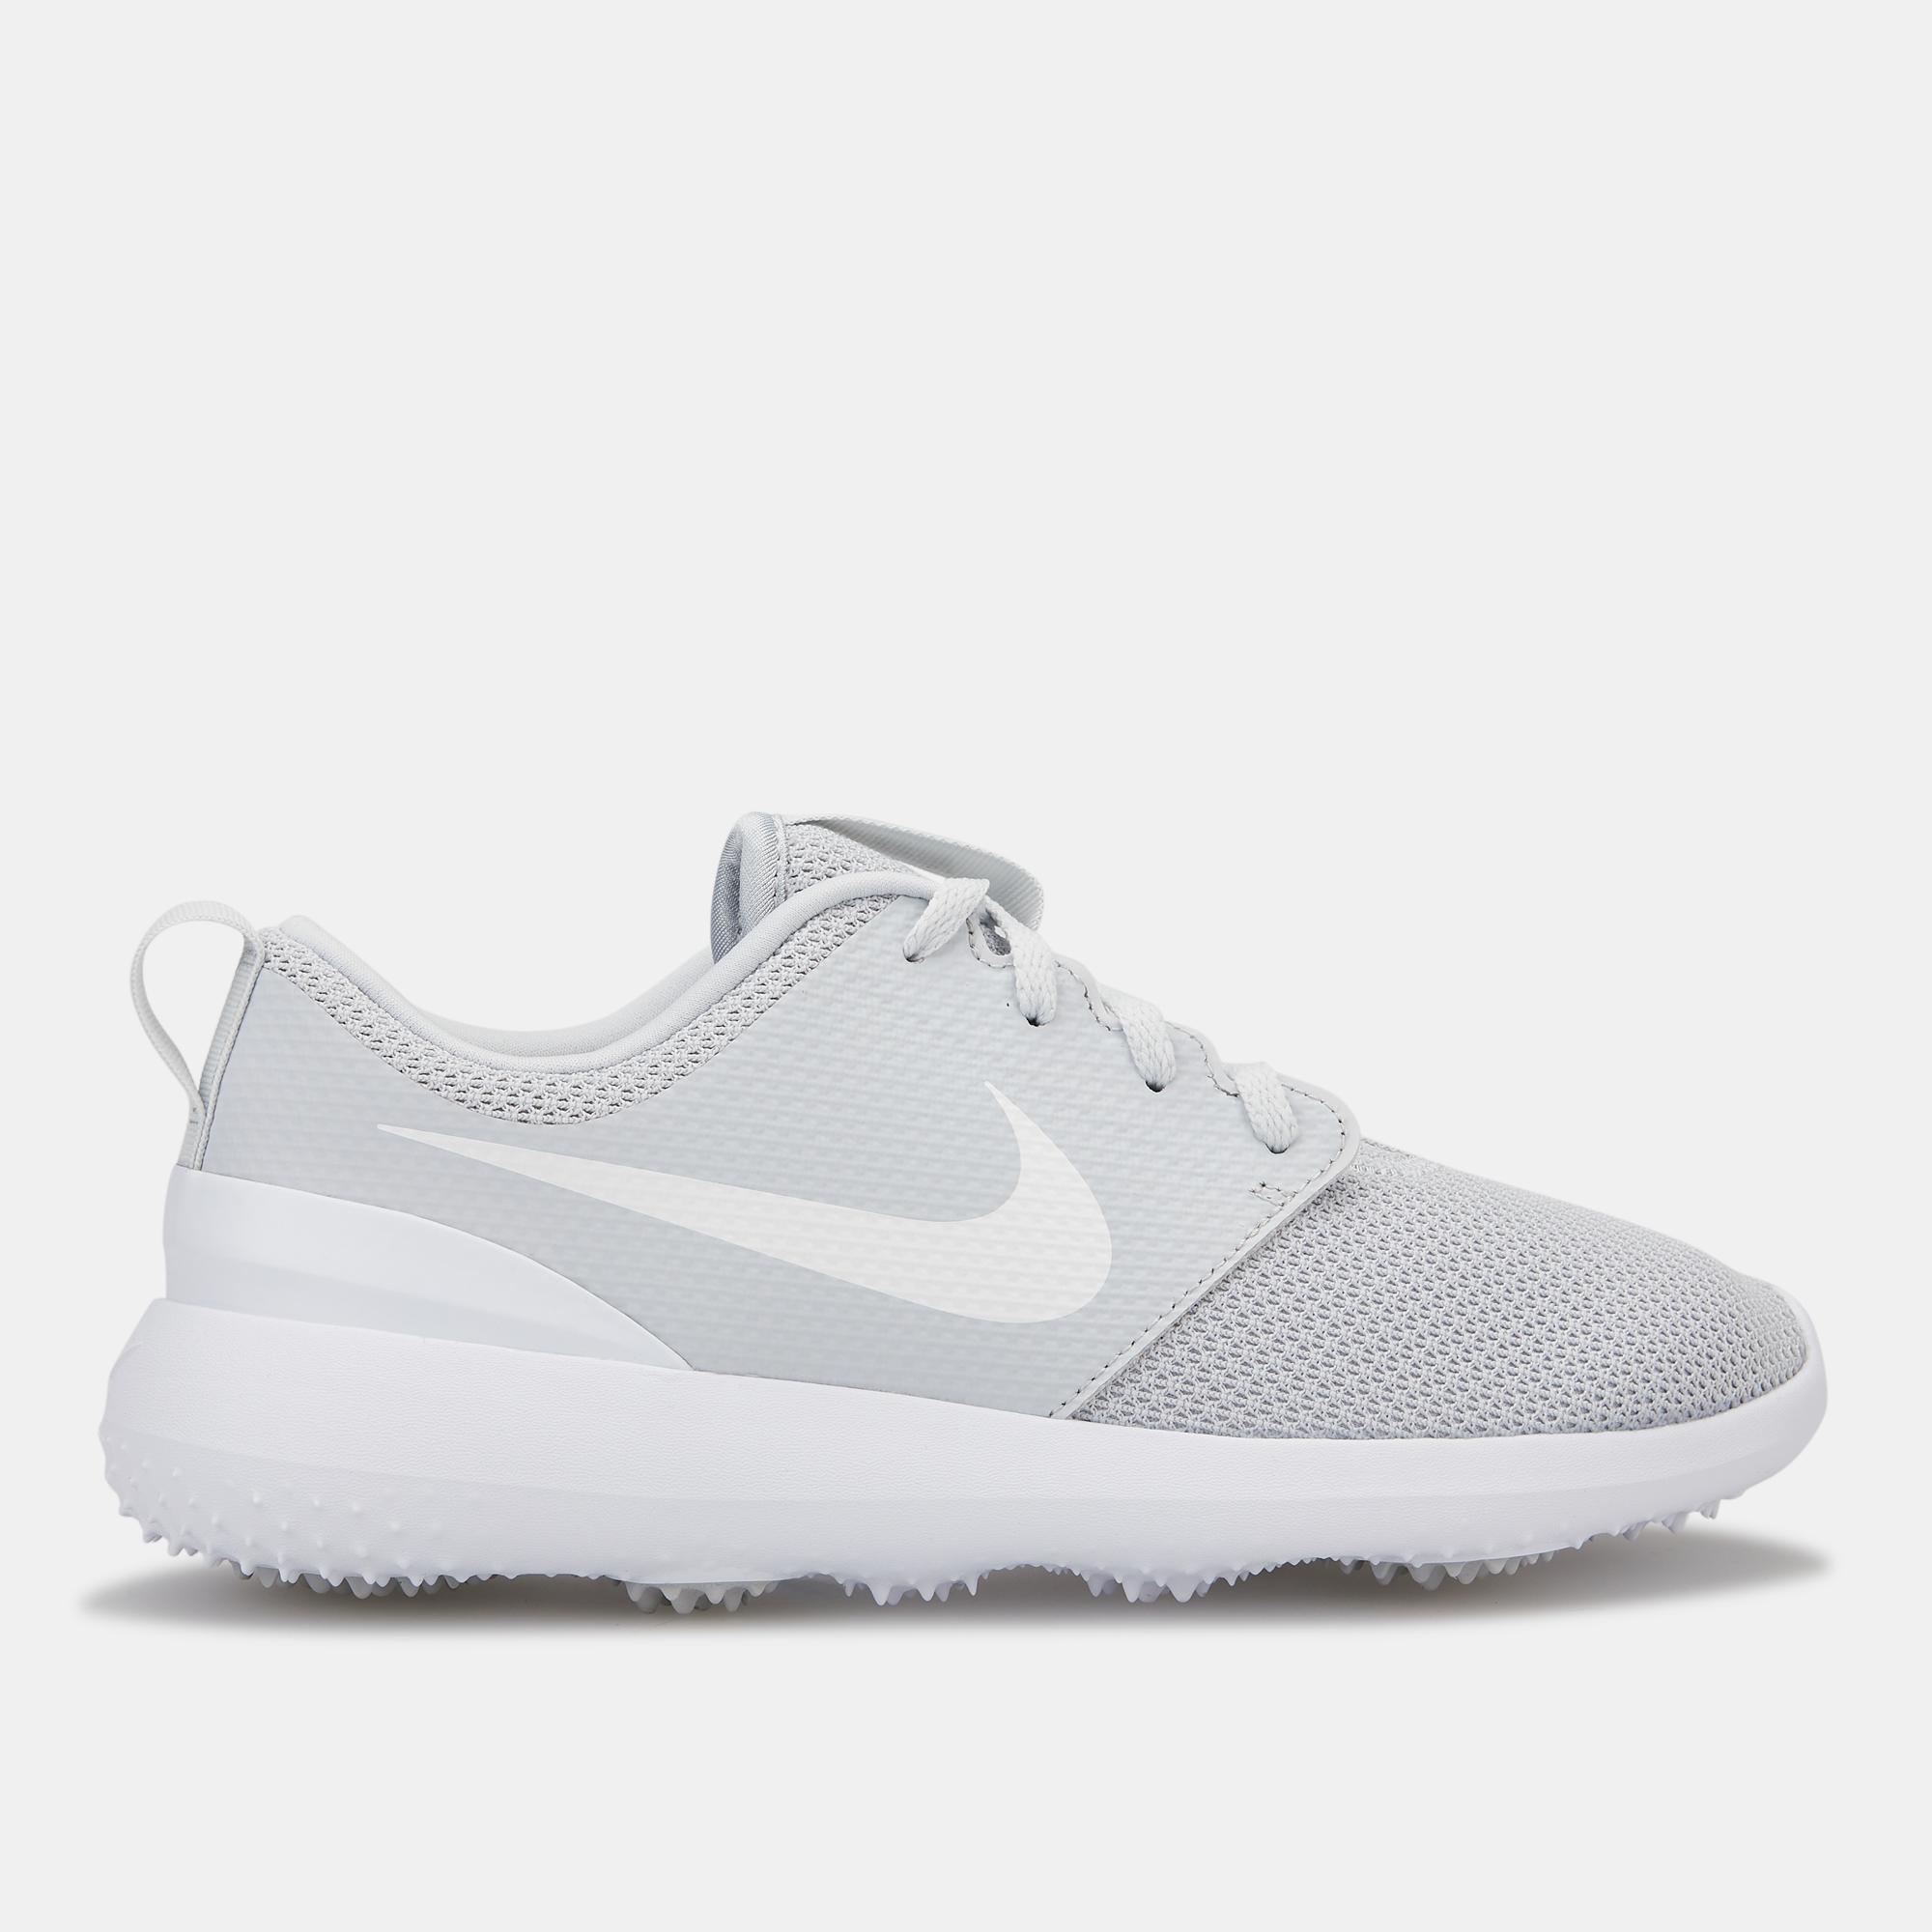 7de78fec4350d Nike Golf Women's Roshe G Shoe | Golf Shoes | Shoes | Womens | SSS